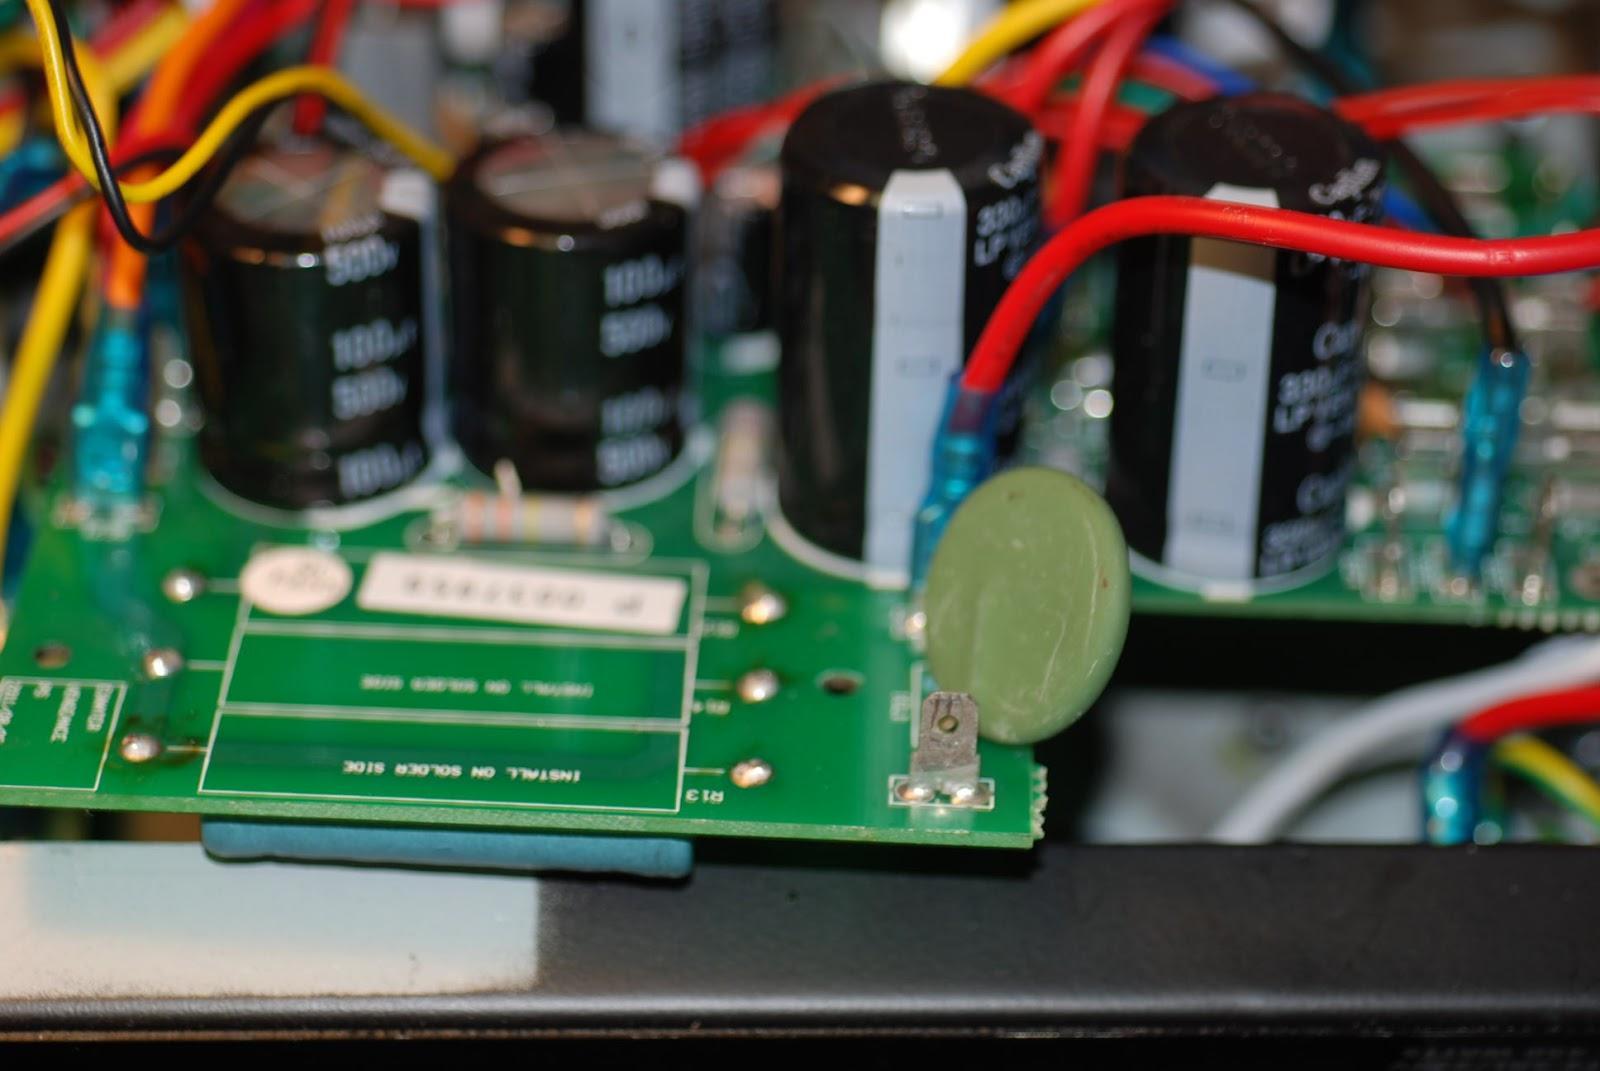 DSC_2789 judybox revival january 2016 liteon ps-5301-08ha wiring diagram at fashall.co